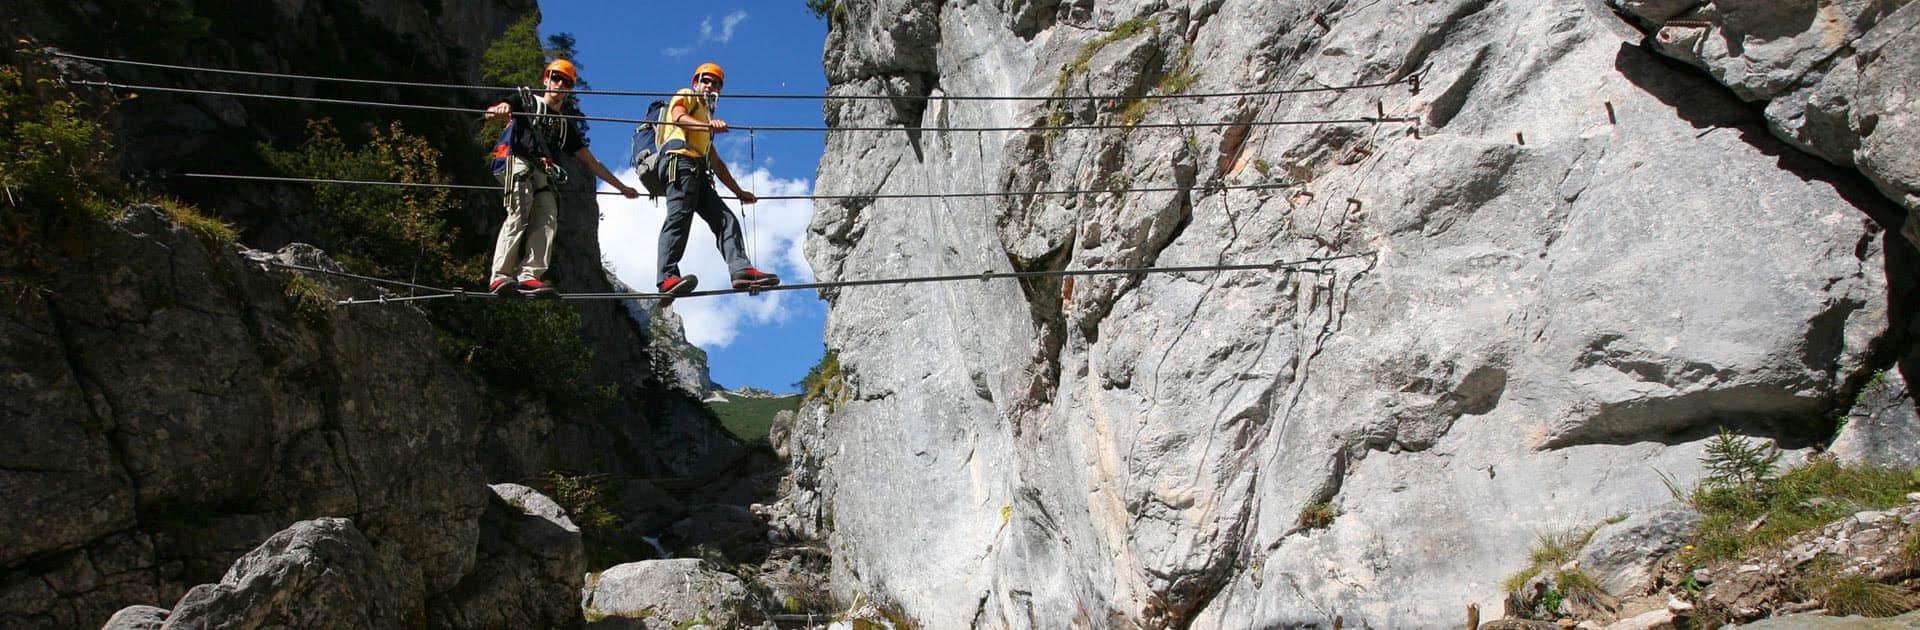 Klettersteig Hias im Silberkar